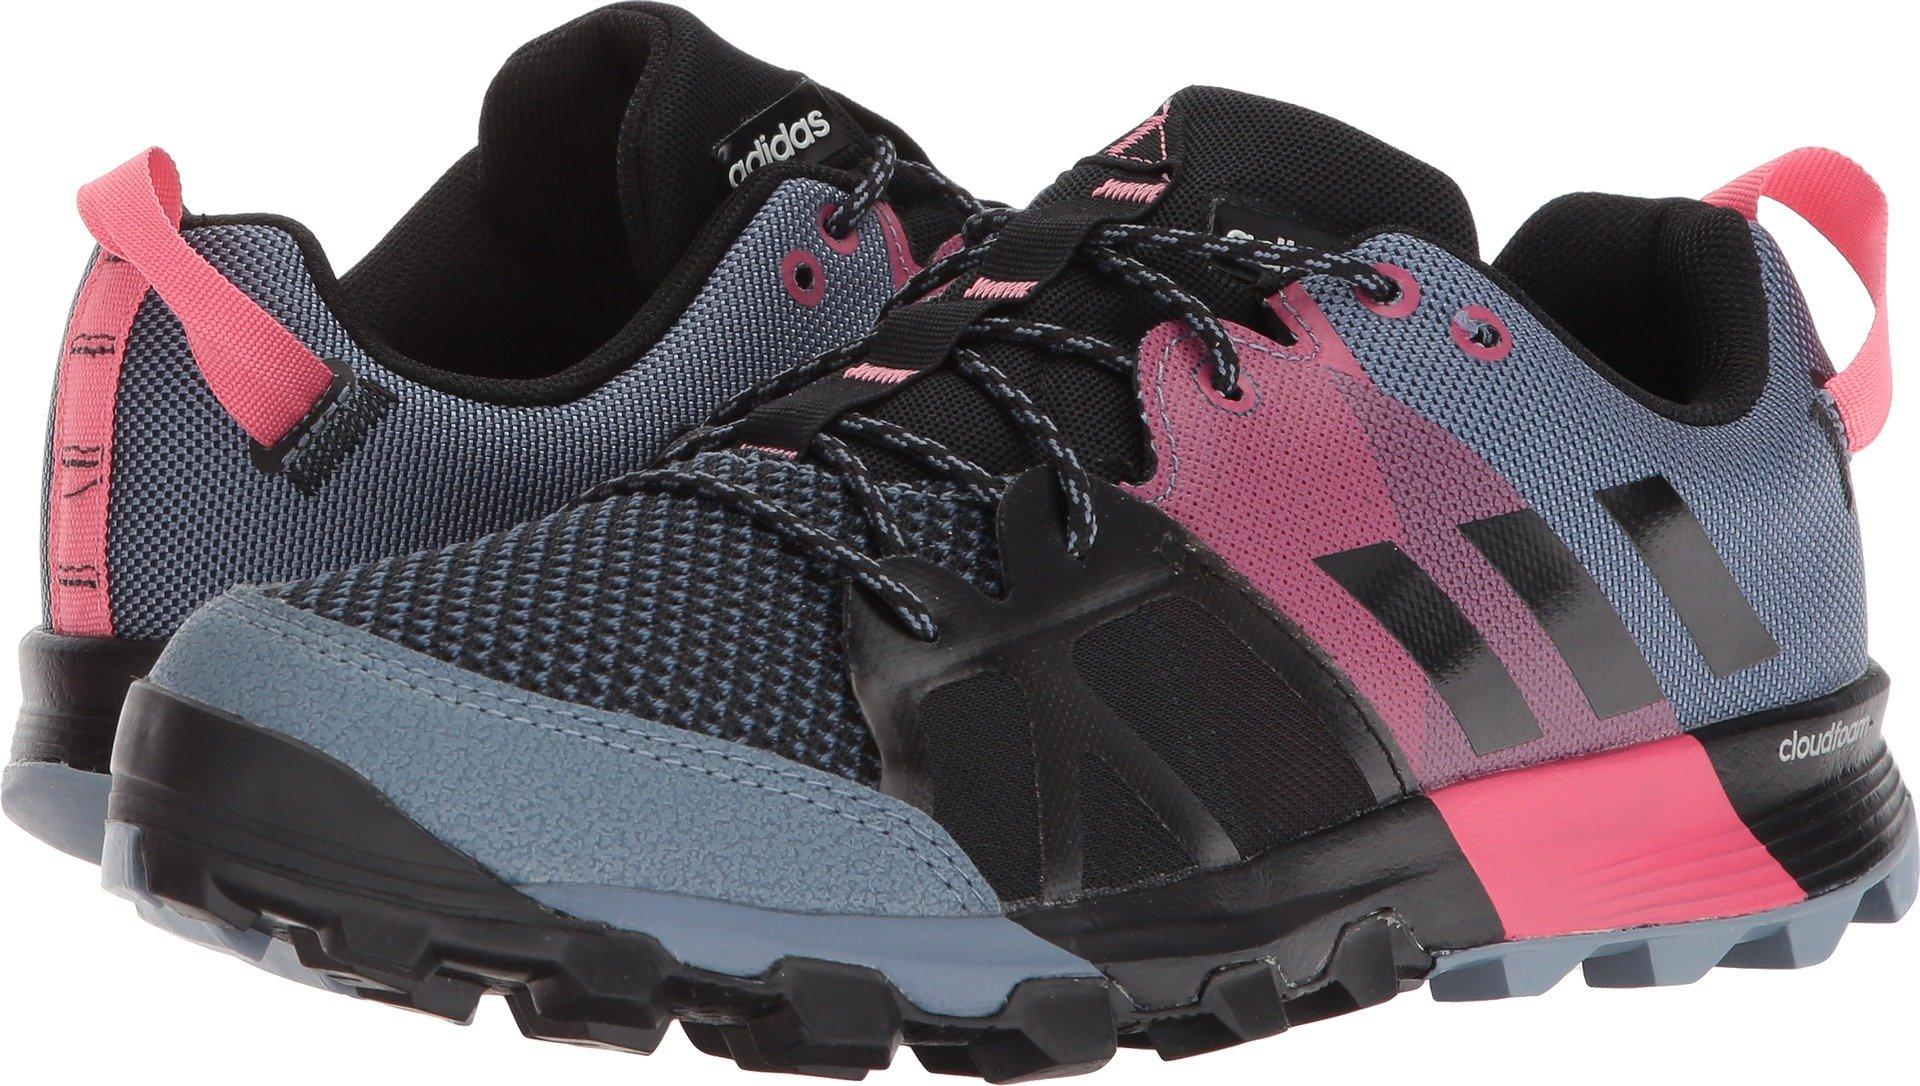 adidas outdoor Women's Kanadia 8.1 W Trail Running Shoe, Raw Steel/Off White/Real Pink, 7.5 M US